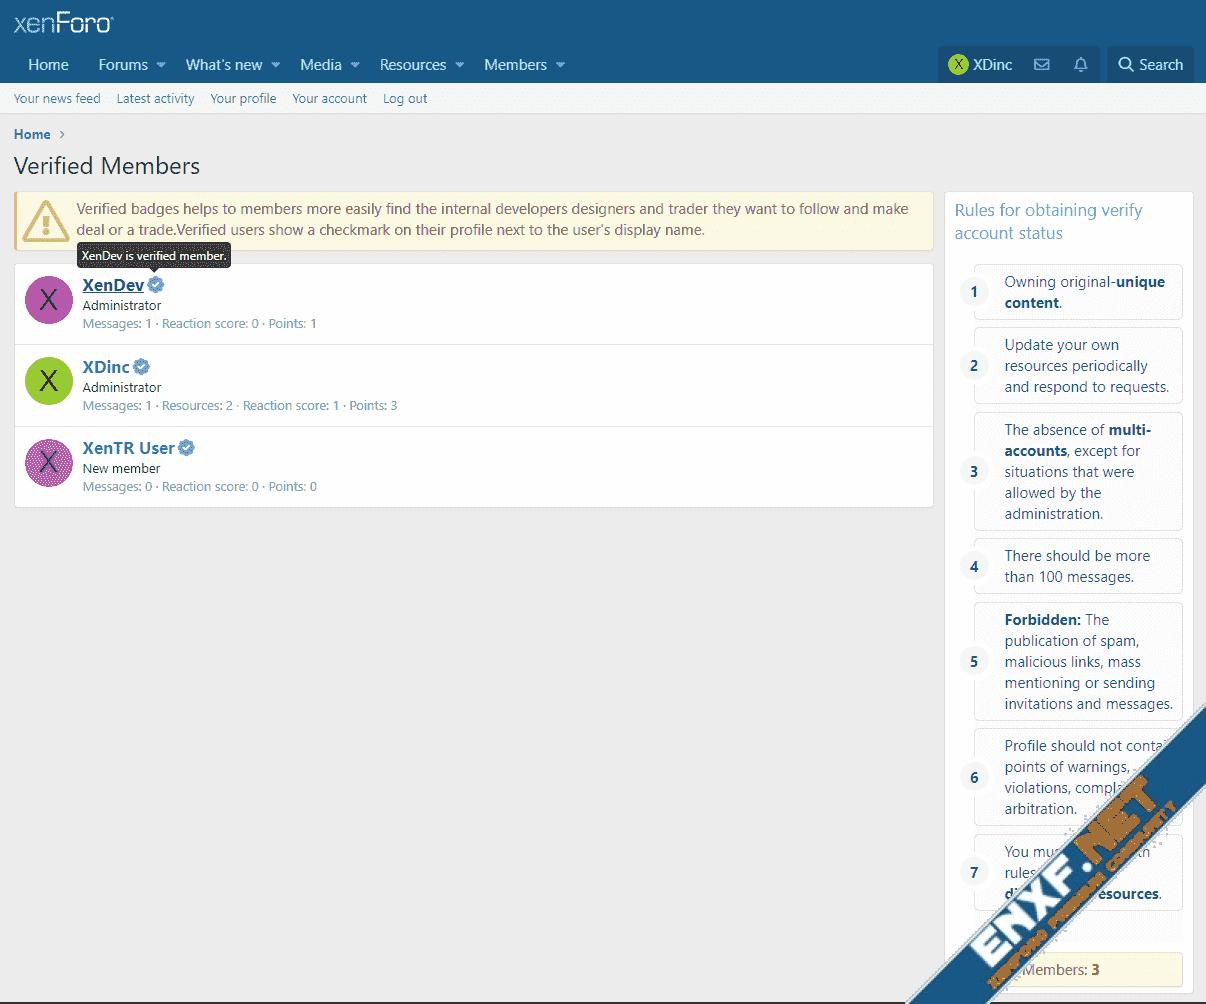 [XTR] Verified Users